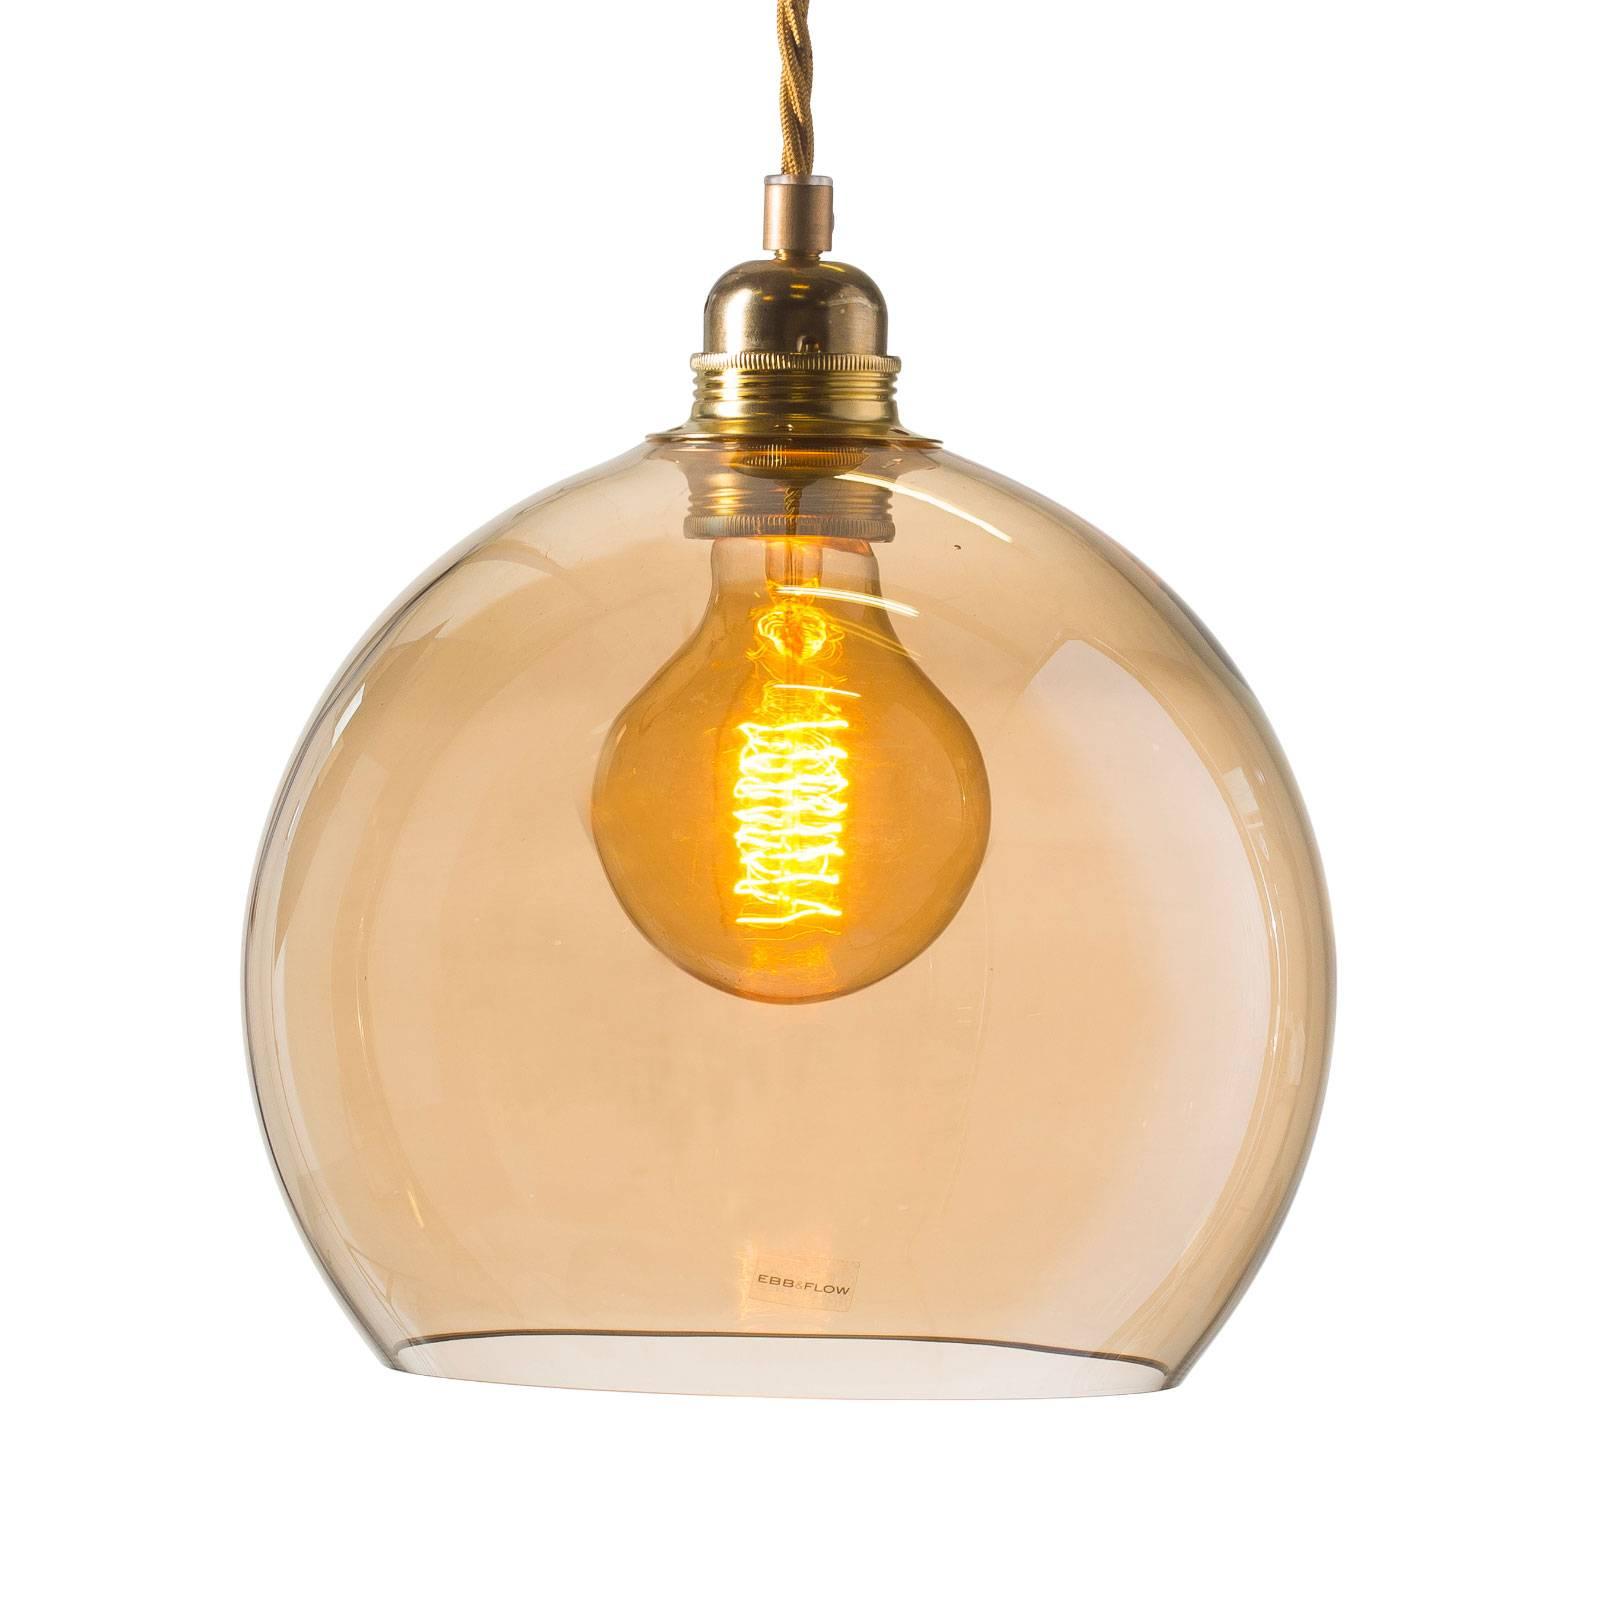 EBB & FLOW Rowan hanglamp goud/goud-rook Ø 22cm